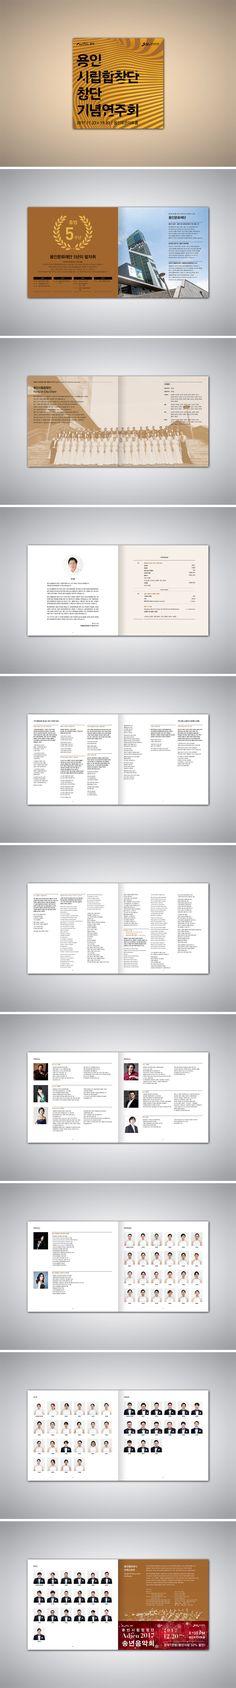 Arirang Client.Yongin Cultural Foundation / Designer. Jin sun mi 용인시립합창단 #디자인 #편집디자인 #포스터 #삼십칠도커뮤니케이션 #37도커뮤니케이션 Magazine Design, Editorial Design, Layout, Album, Book, Page Layout, Books, Livres, Libros